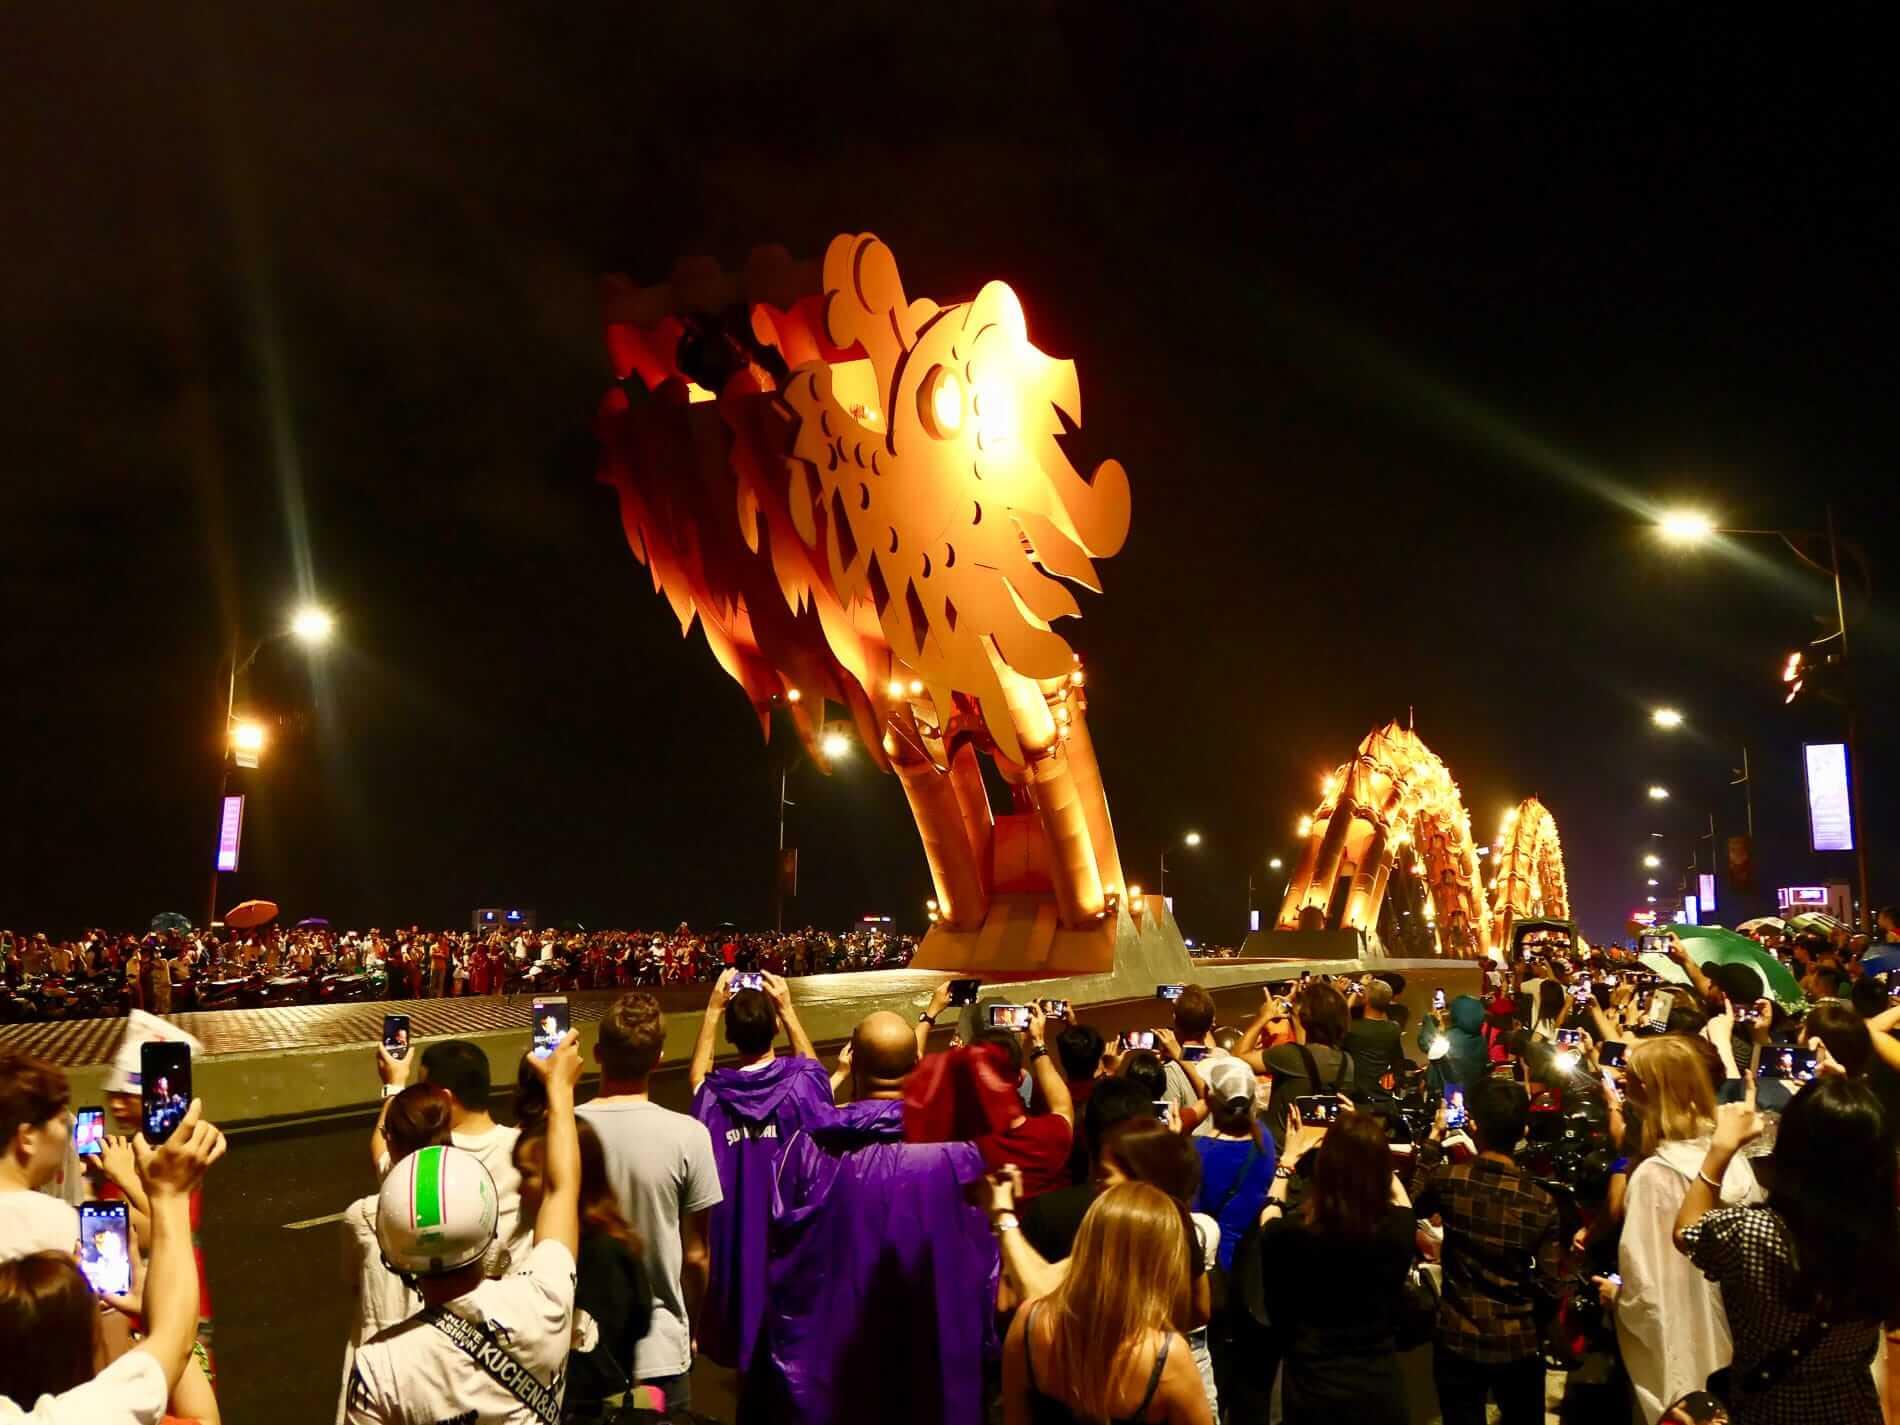 visitors watch the Dragon Bridge fire show